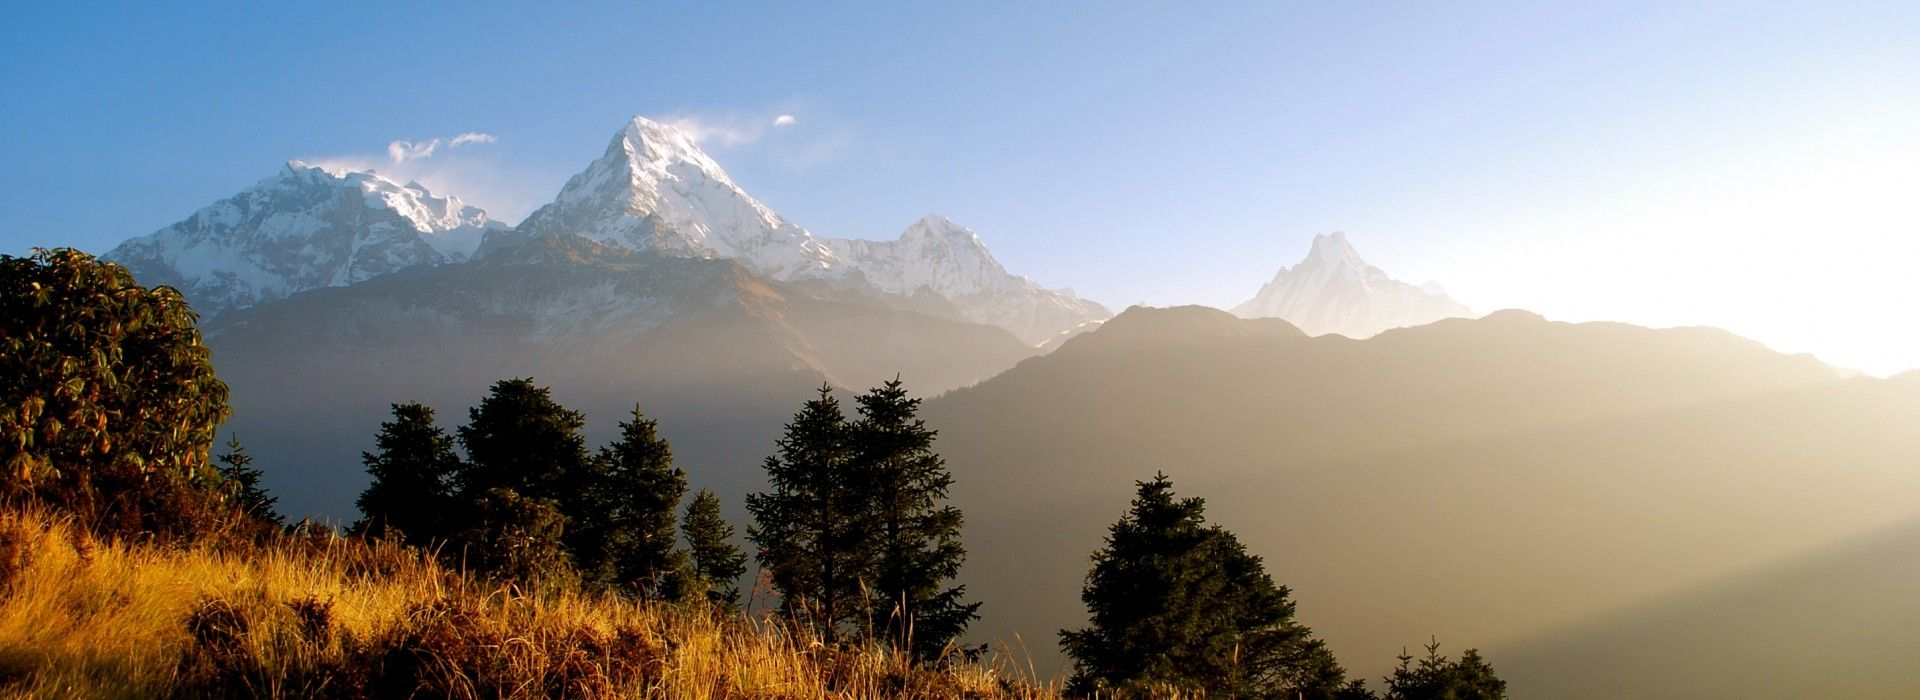 Adventure Tours in Annapurna Base Camp trek